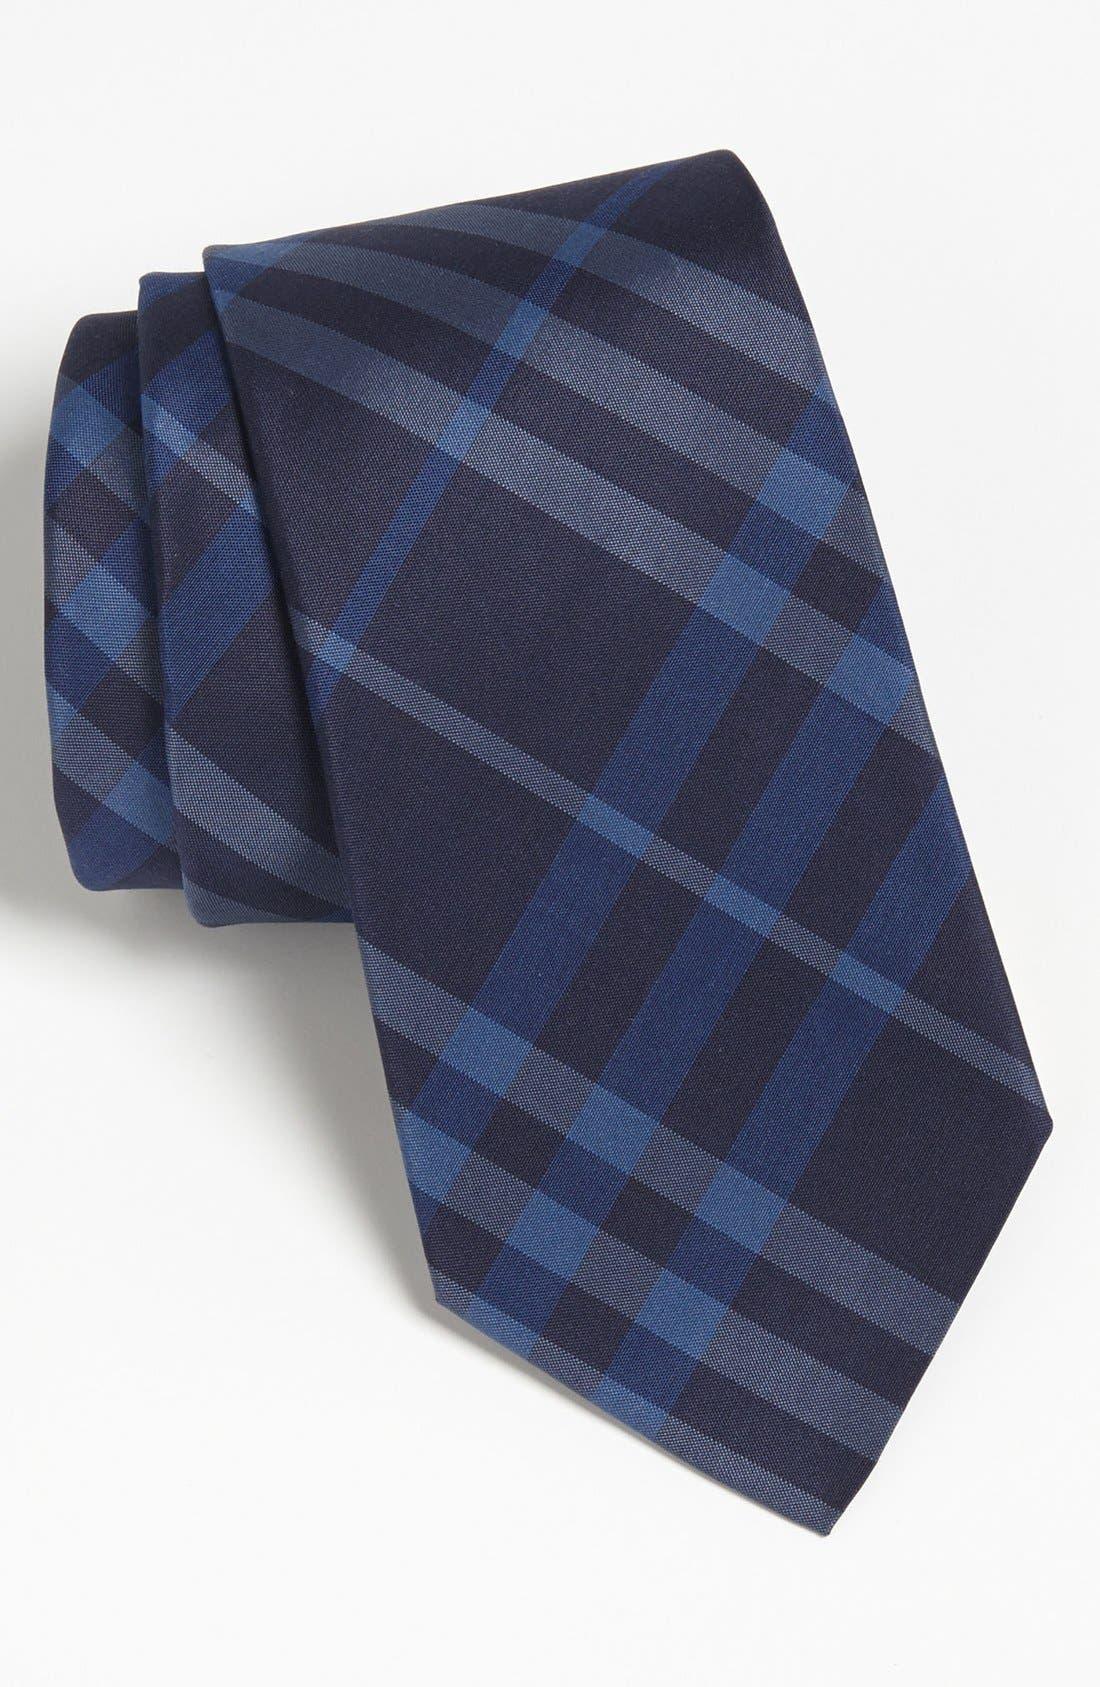 Main Image - Burberry London Woven Tie